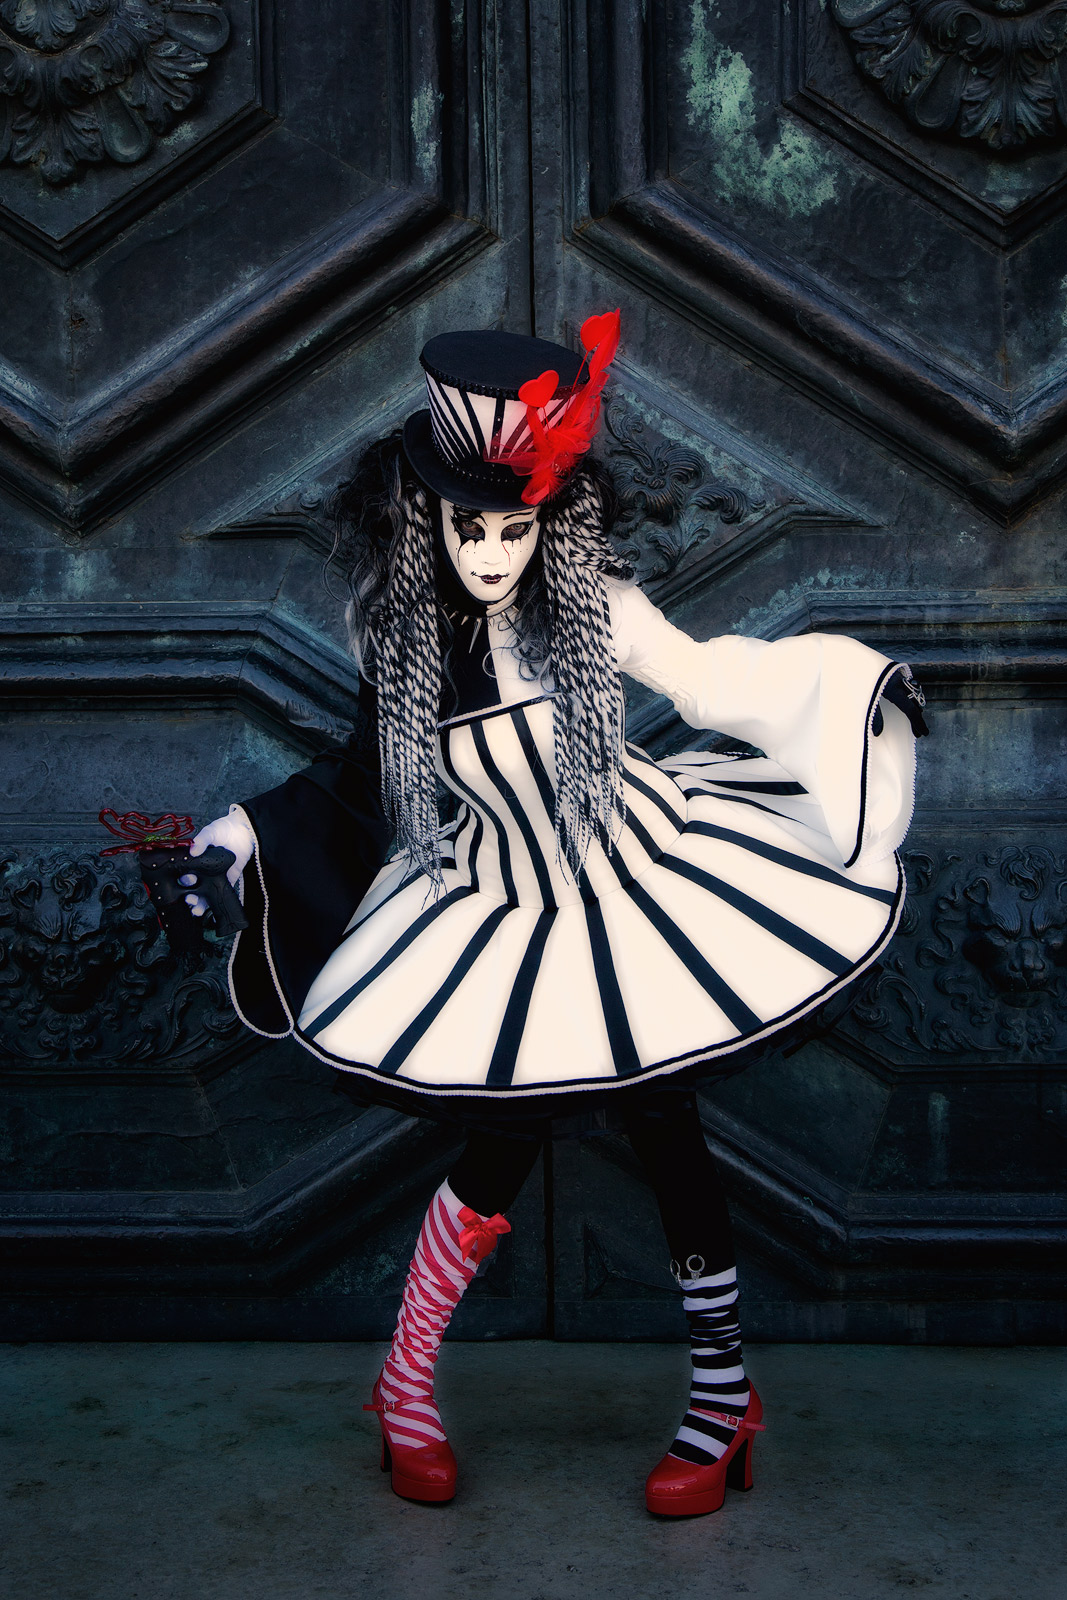 carnival, celebration, colorful, costume, daniela, daniela schmid, europe, italy, mask, party, san gorgio, venice, vertical, photo